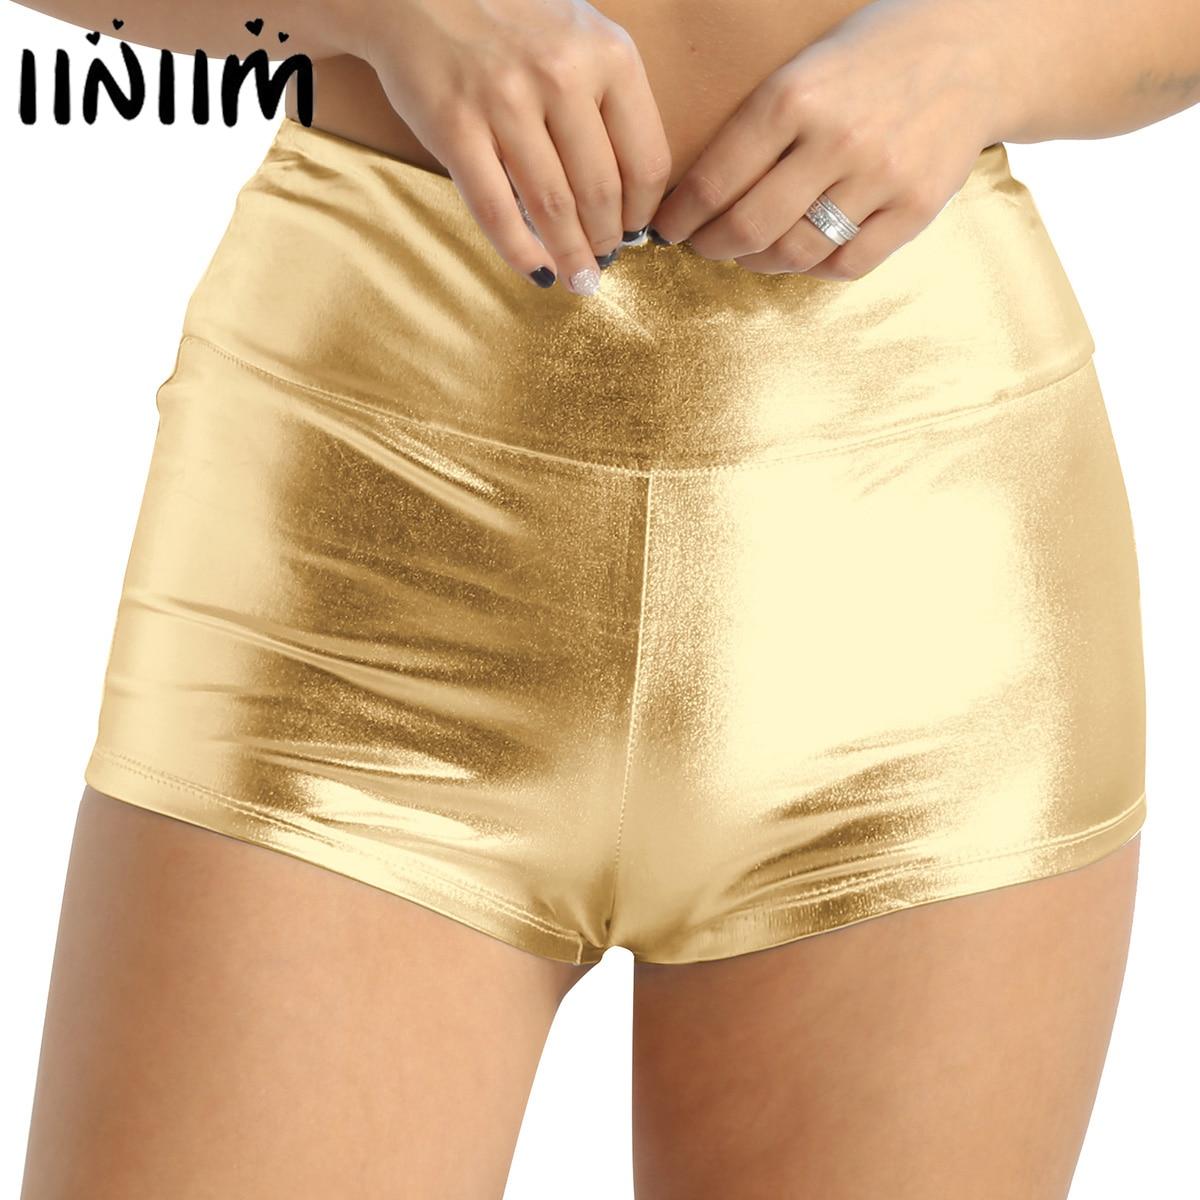 Womens Shiny Metallic High Waist Shorts Hot Pants